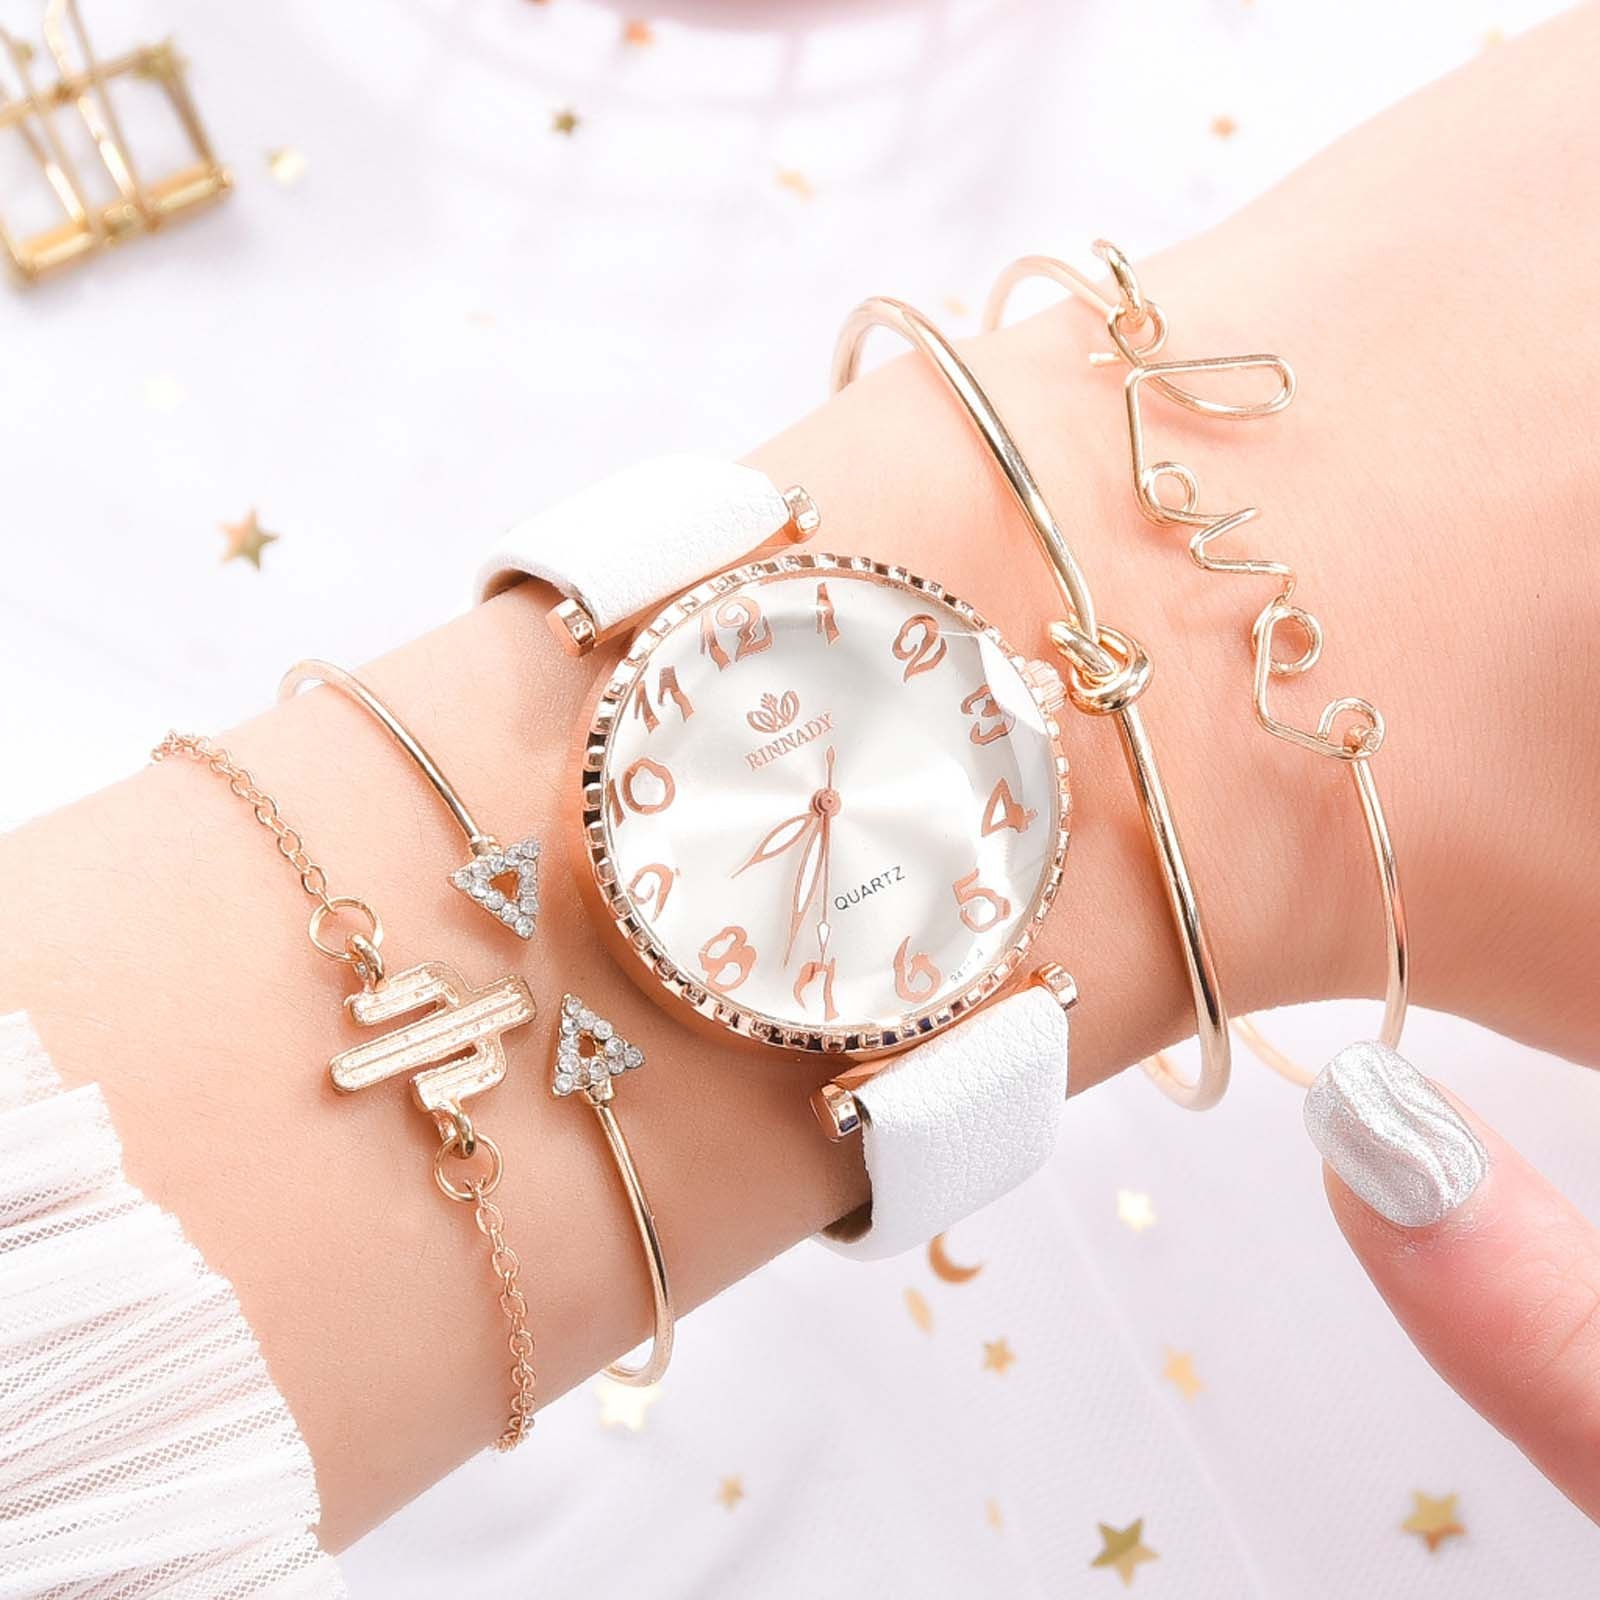 Luxury Style Fashion Women's Watch Luxury Leather Band Analog Quartz WristWatch Ladies quartz watche